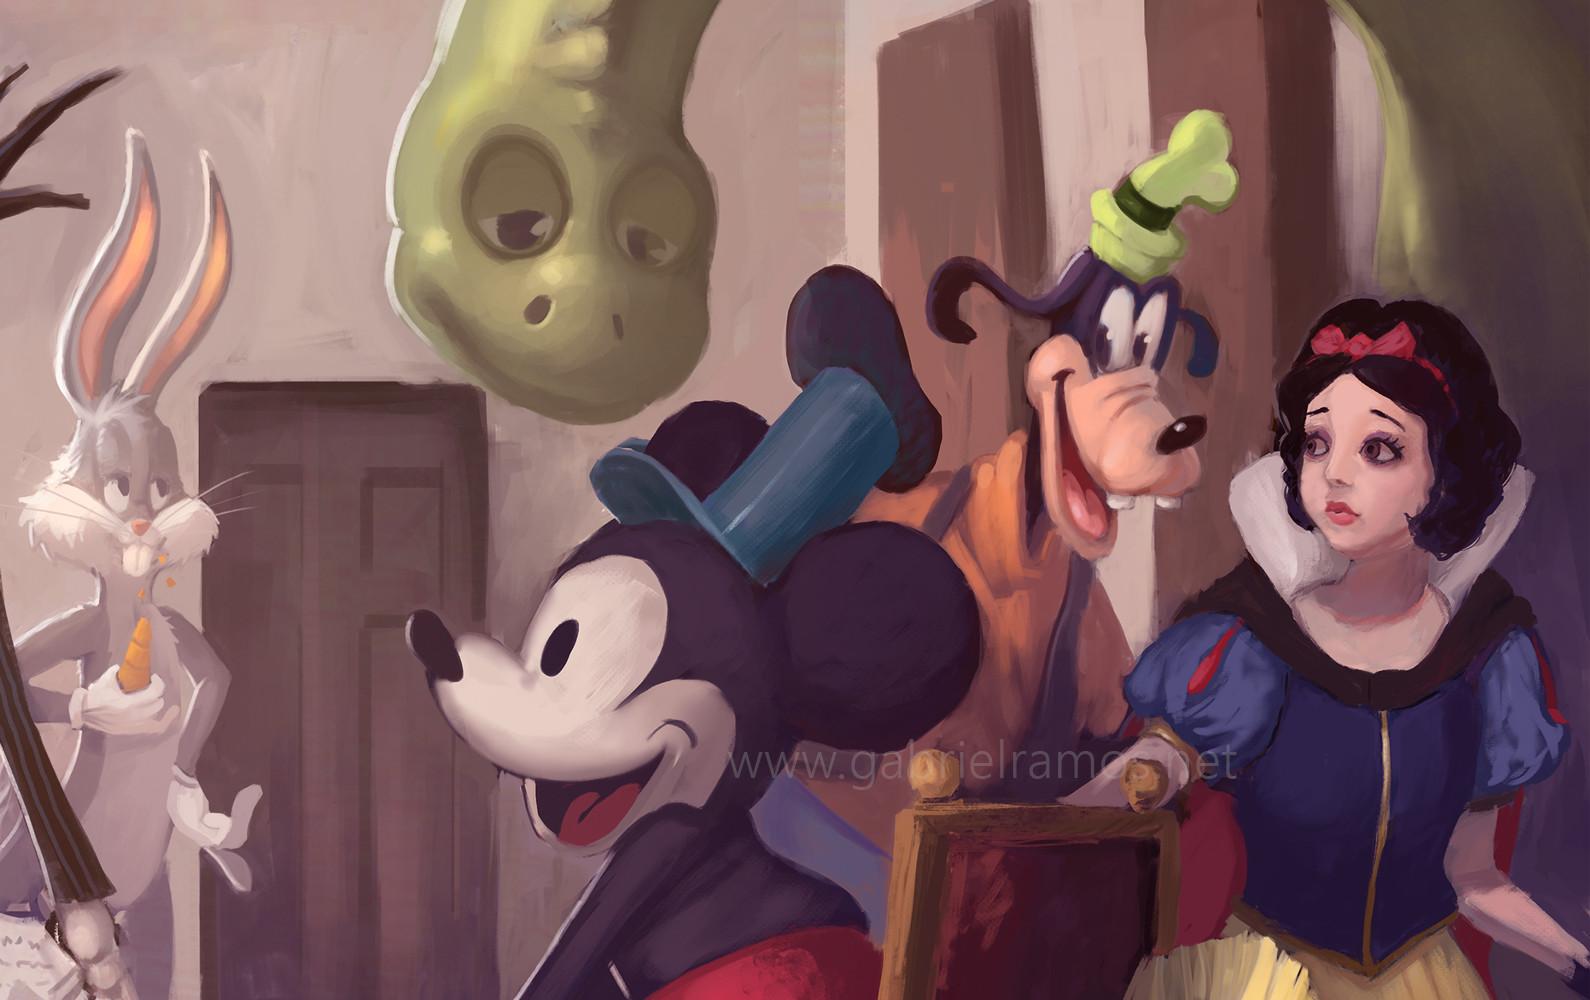 Gabriel ramos animationhistoryfinisheddetail1